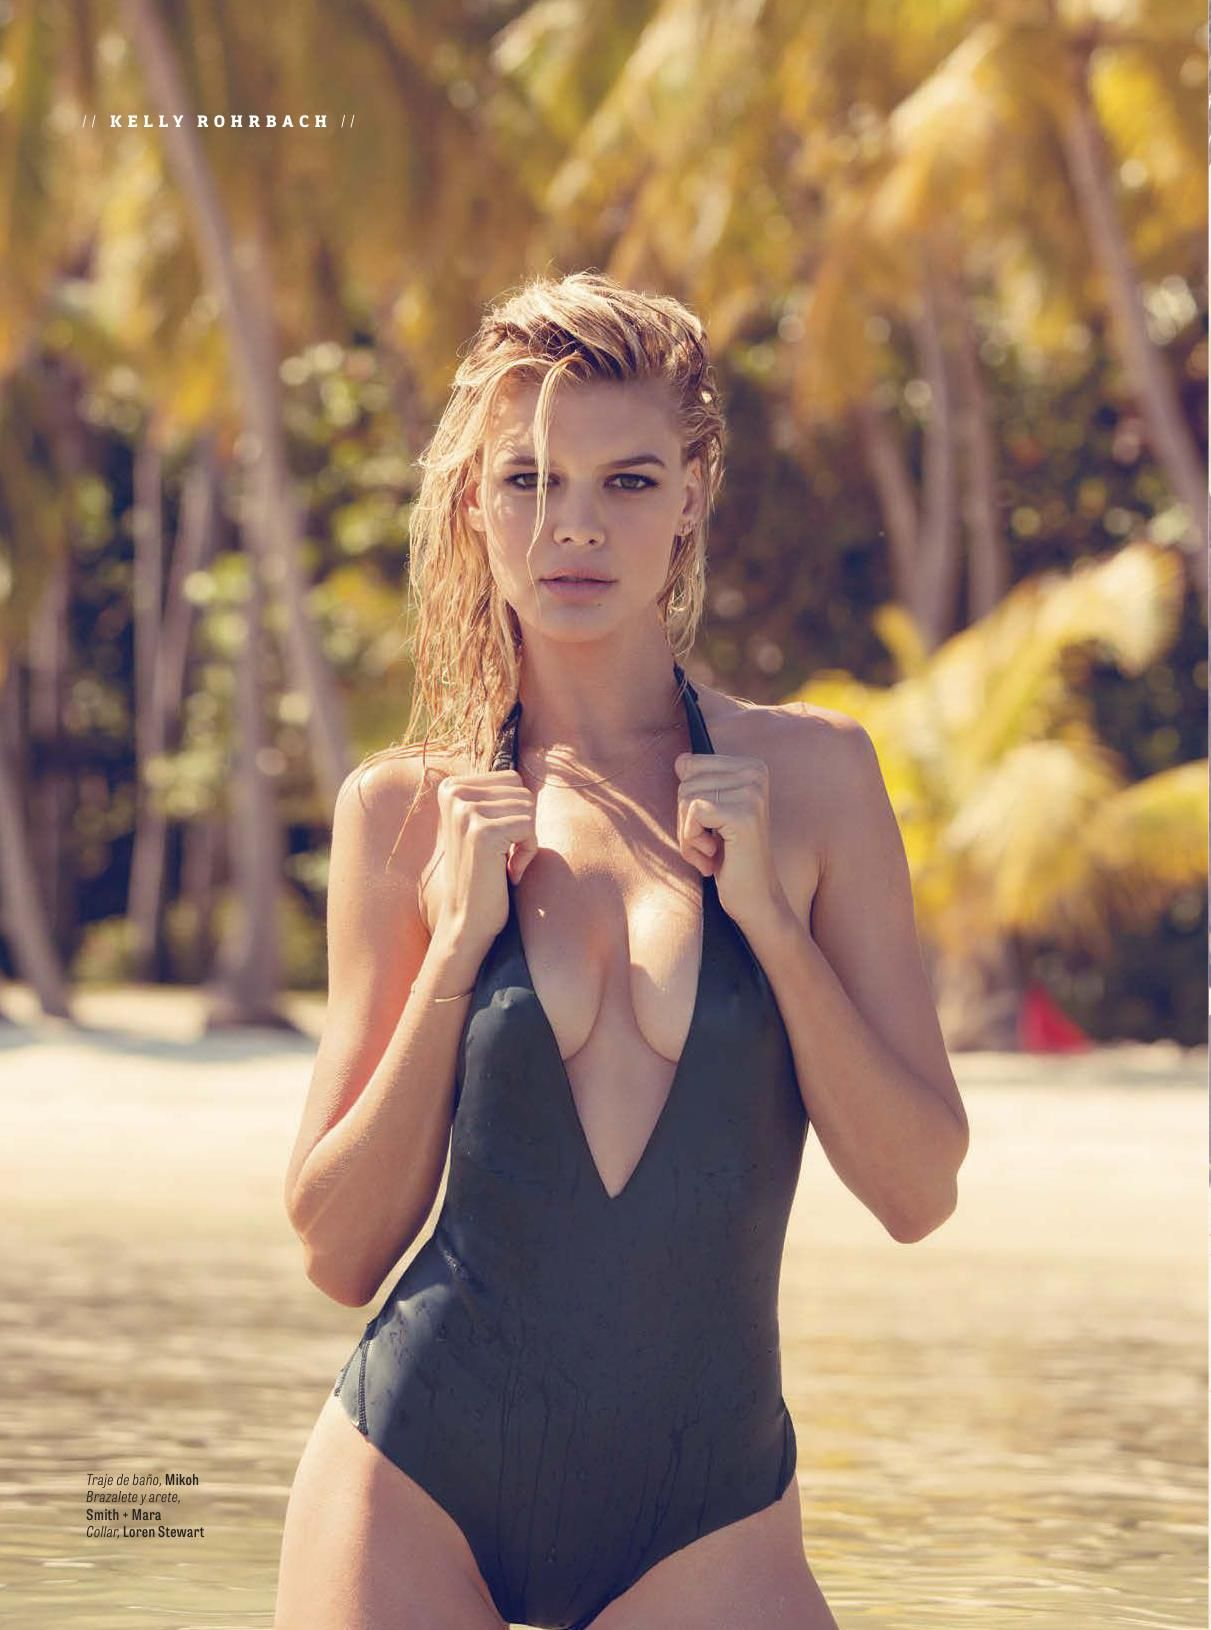 Kelly-Rohrbach-Sexy-9 (1)